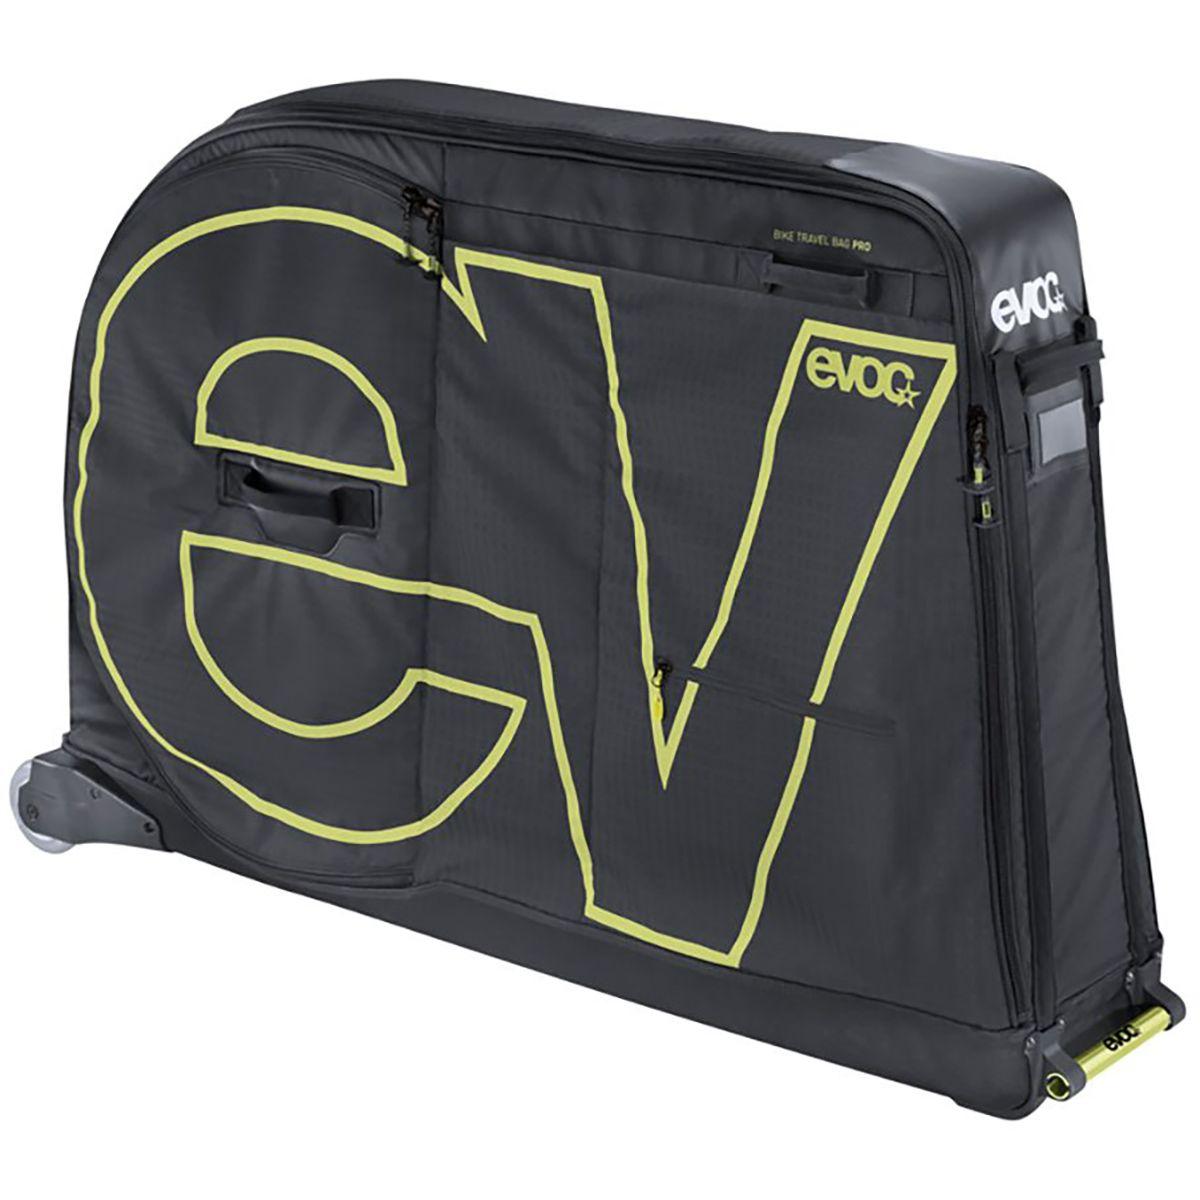 Evoc Bike Travel Bag Pro Black 280L